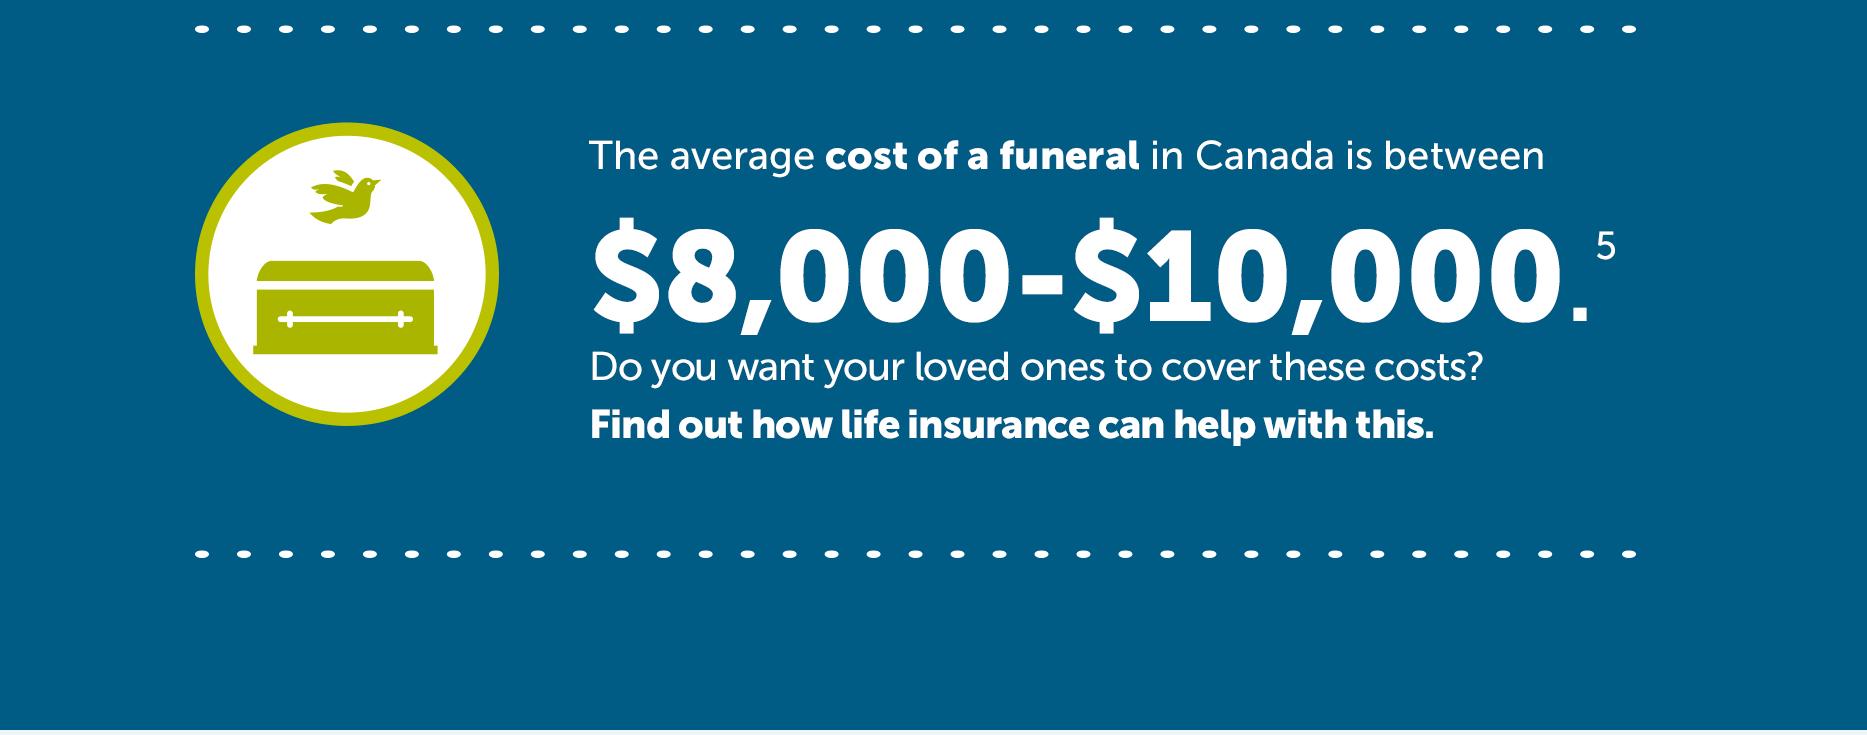 Millennial Life Insurance Statistic 3